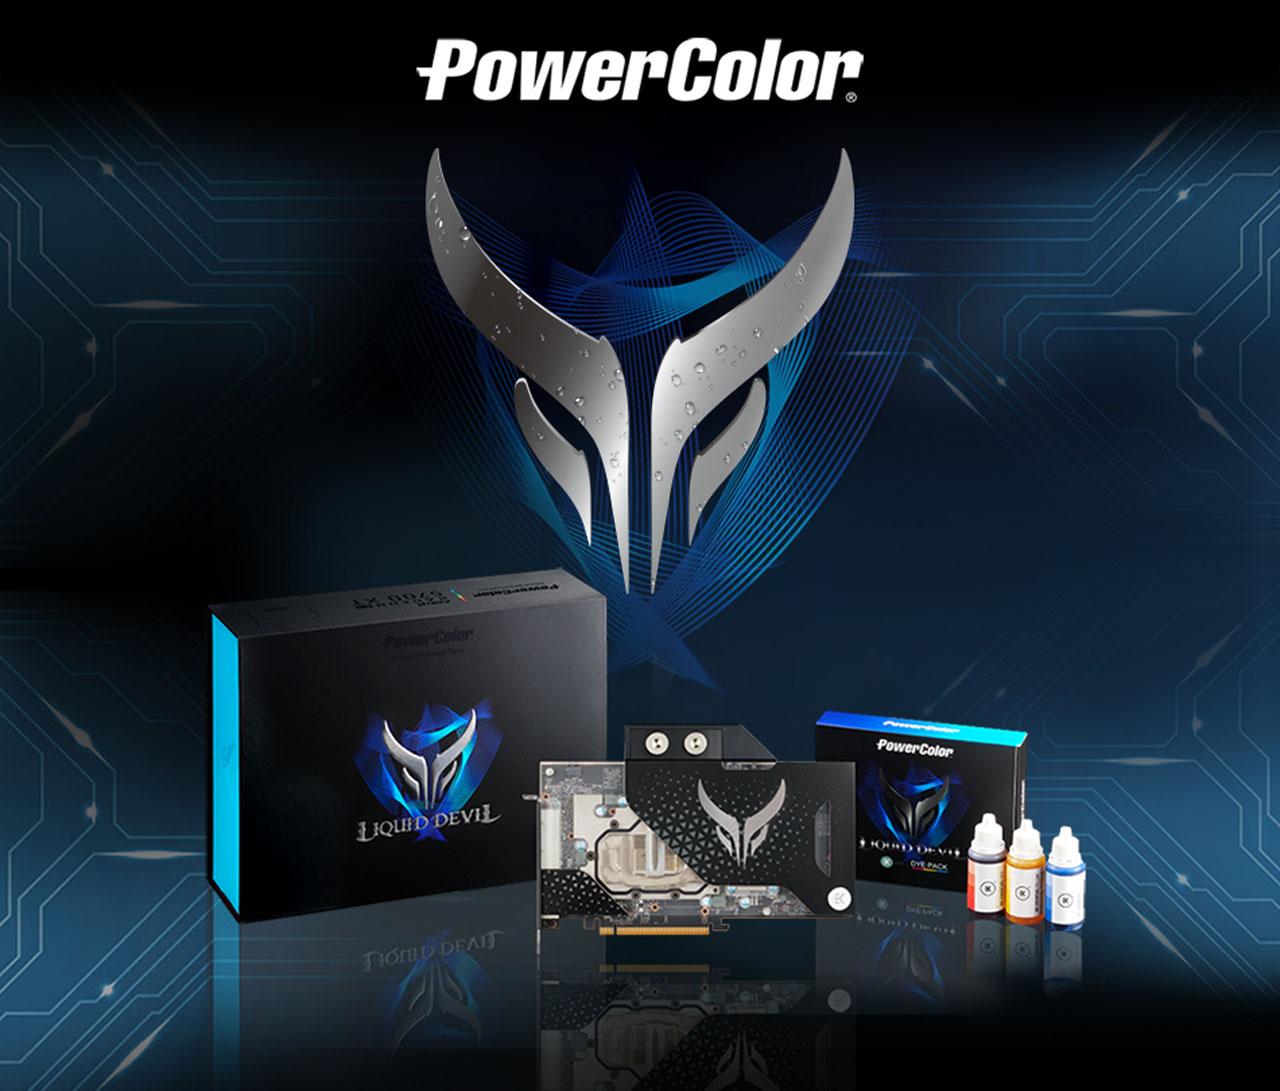 PowerColor logo and Liquid Devil Radeon RX 5700 XT facing forward and packing box